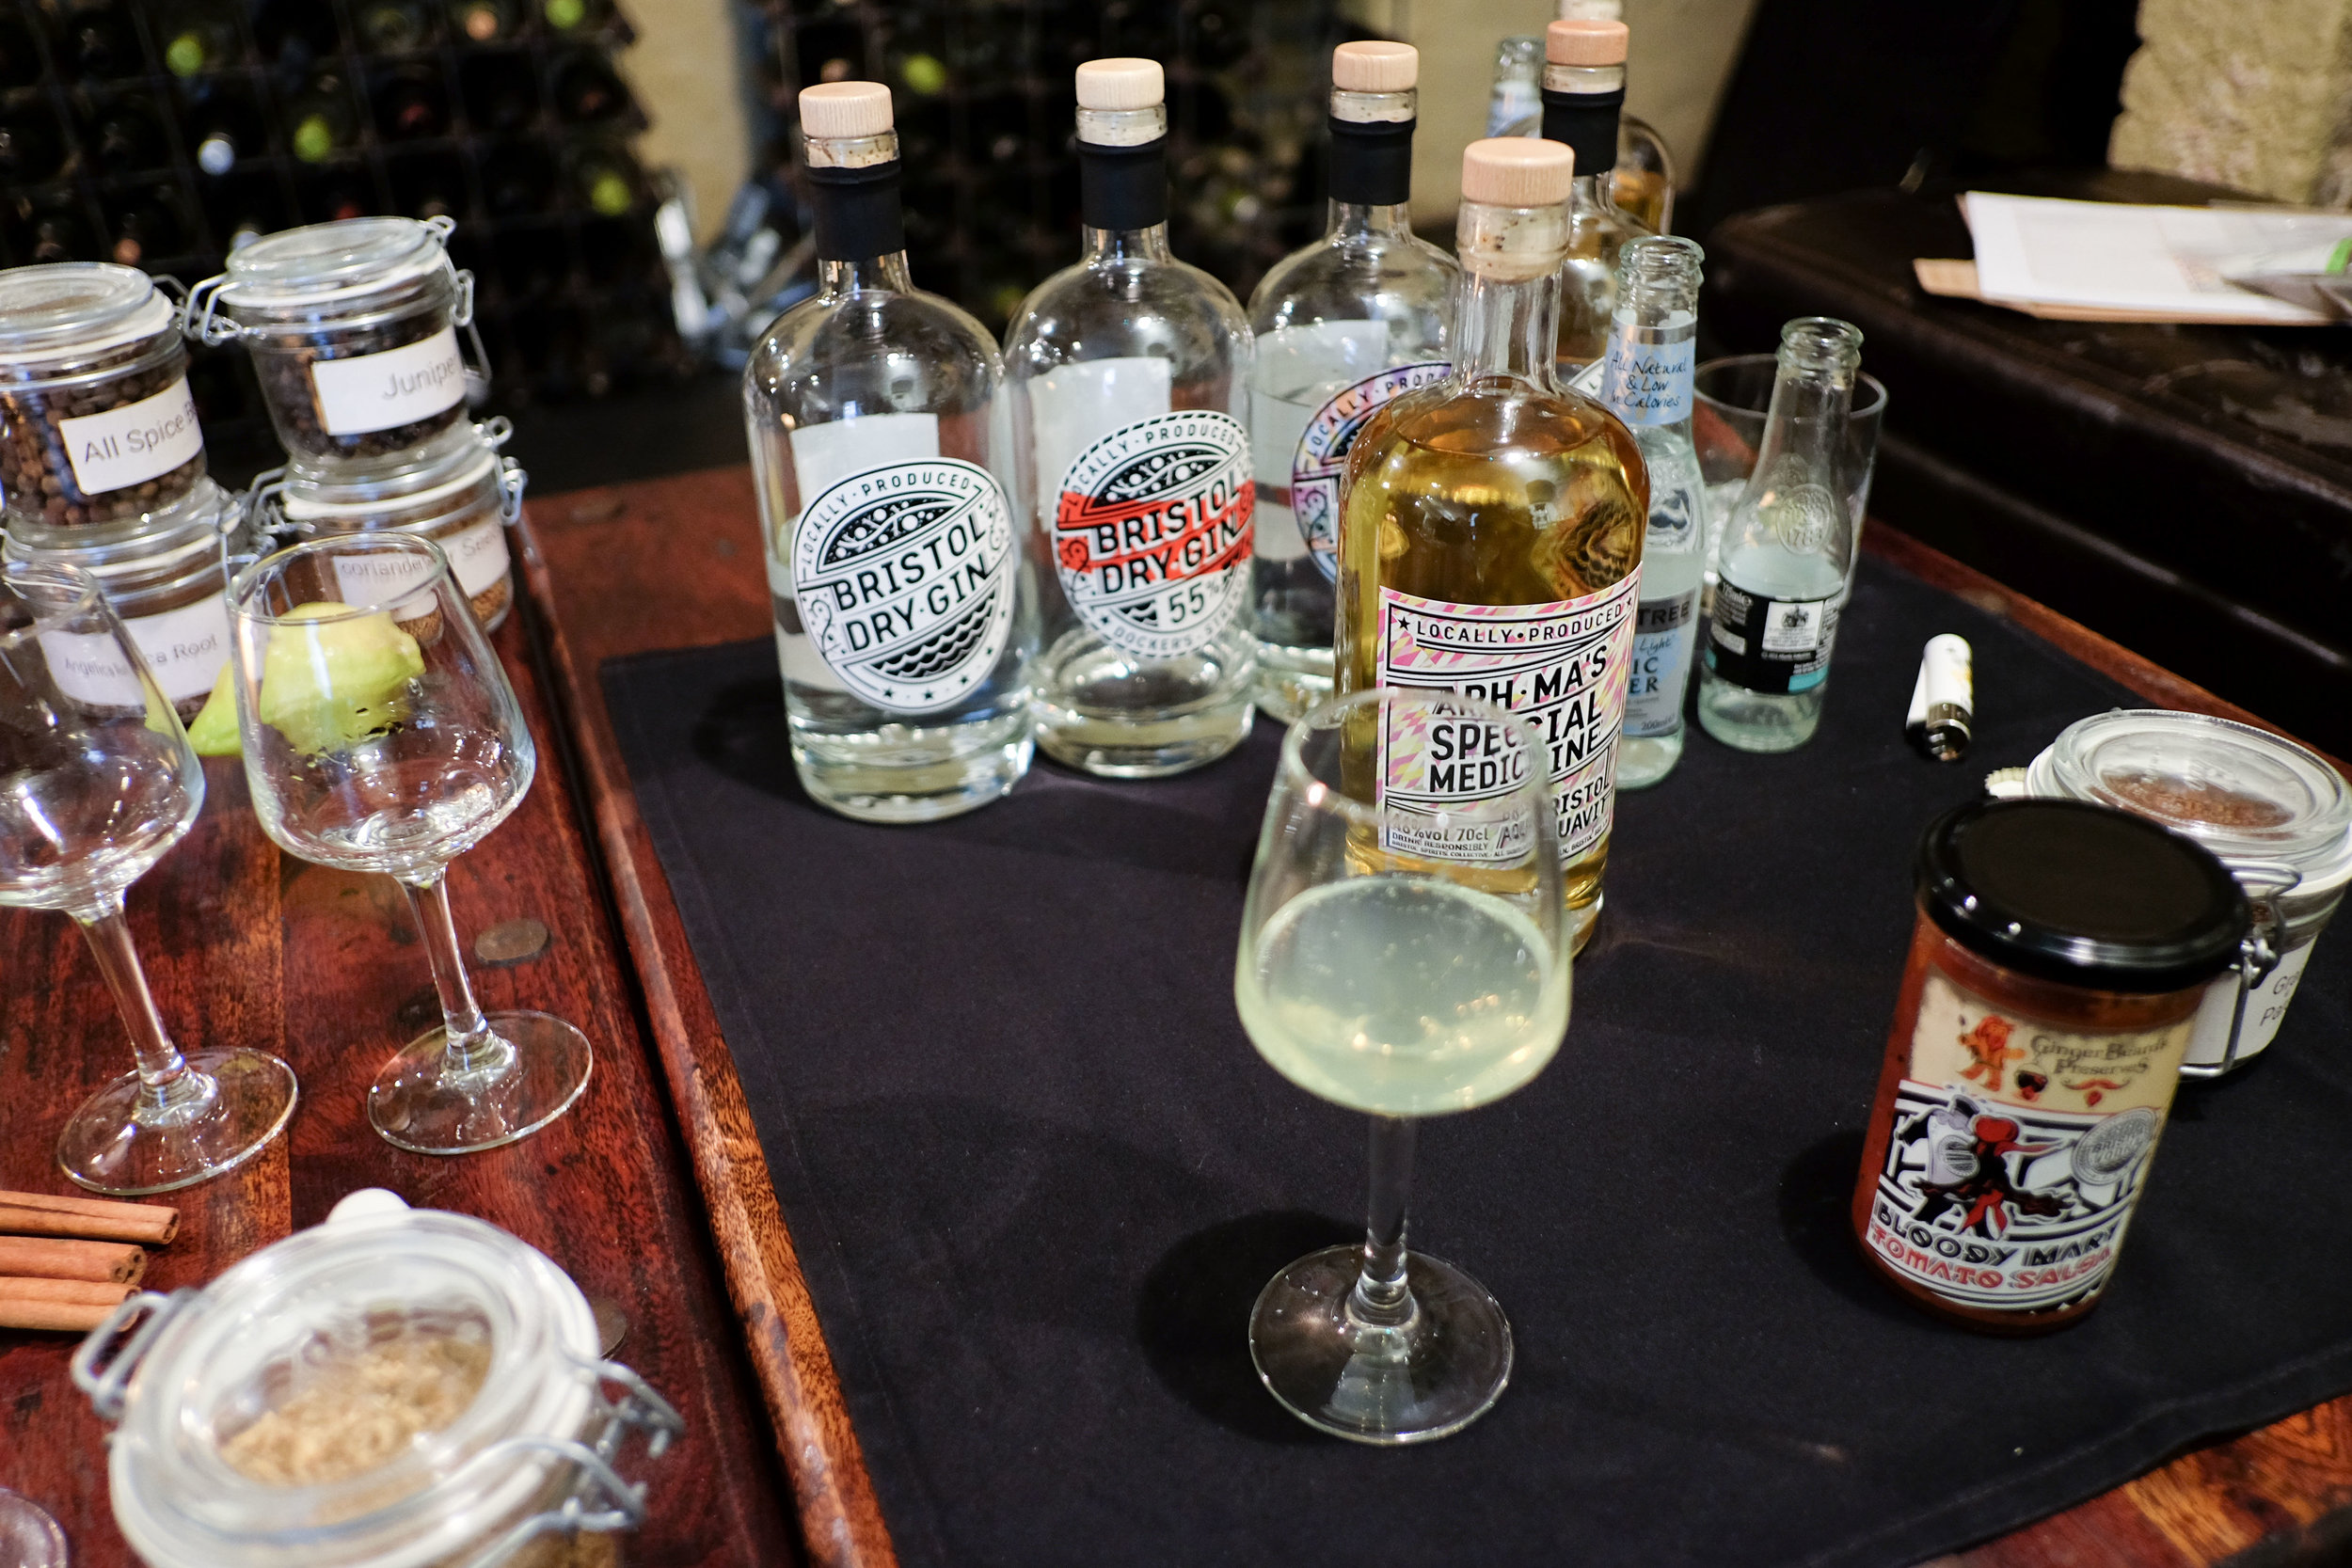 bristol_dry_gin_tasting